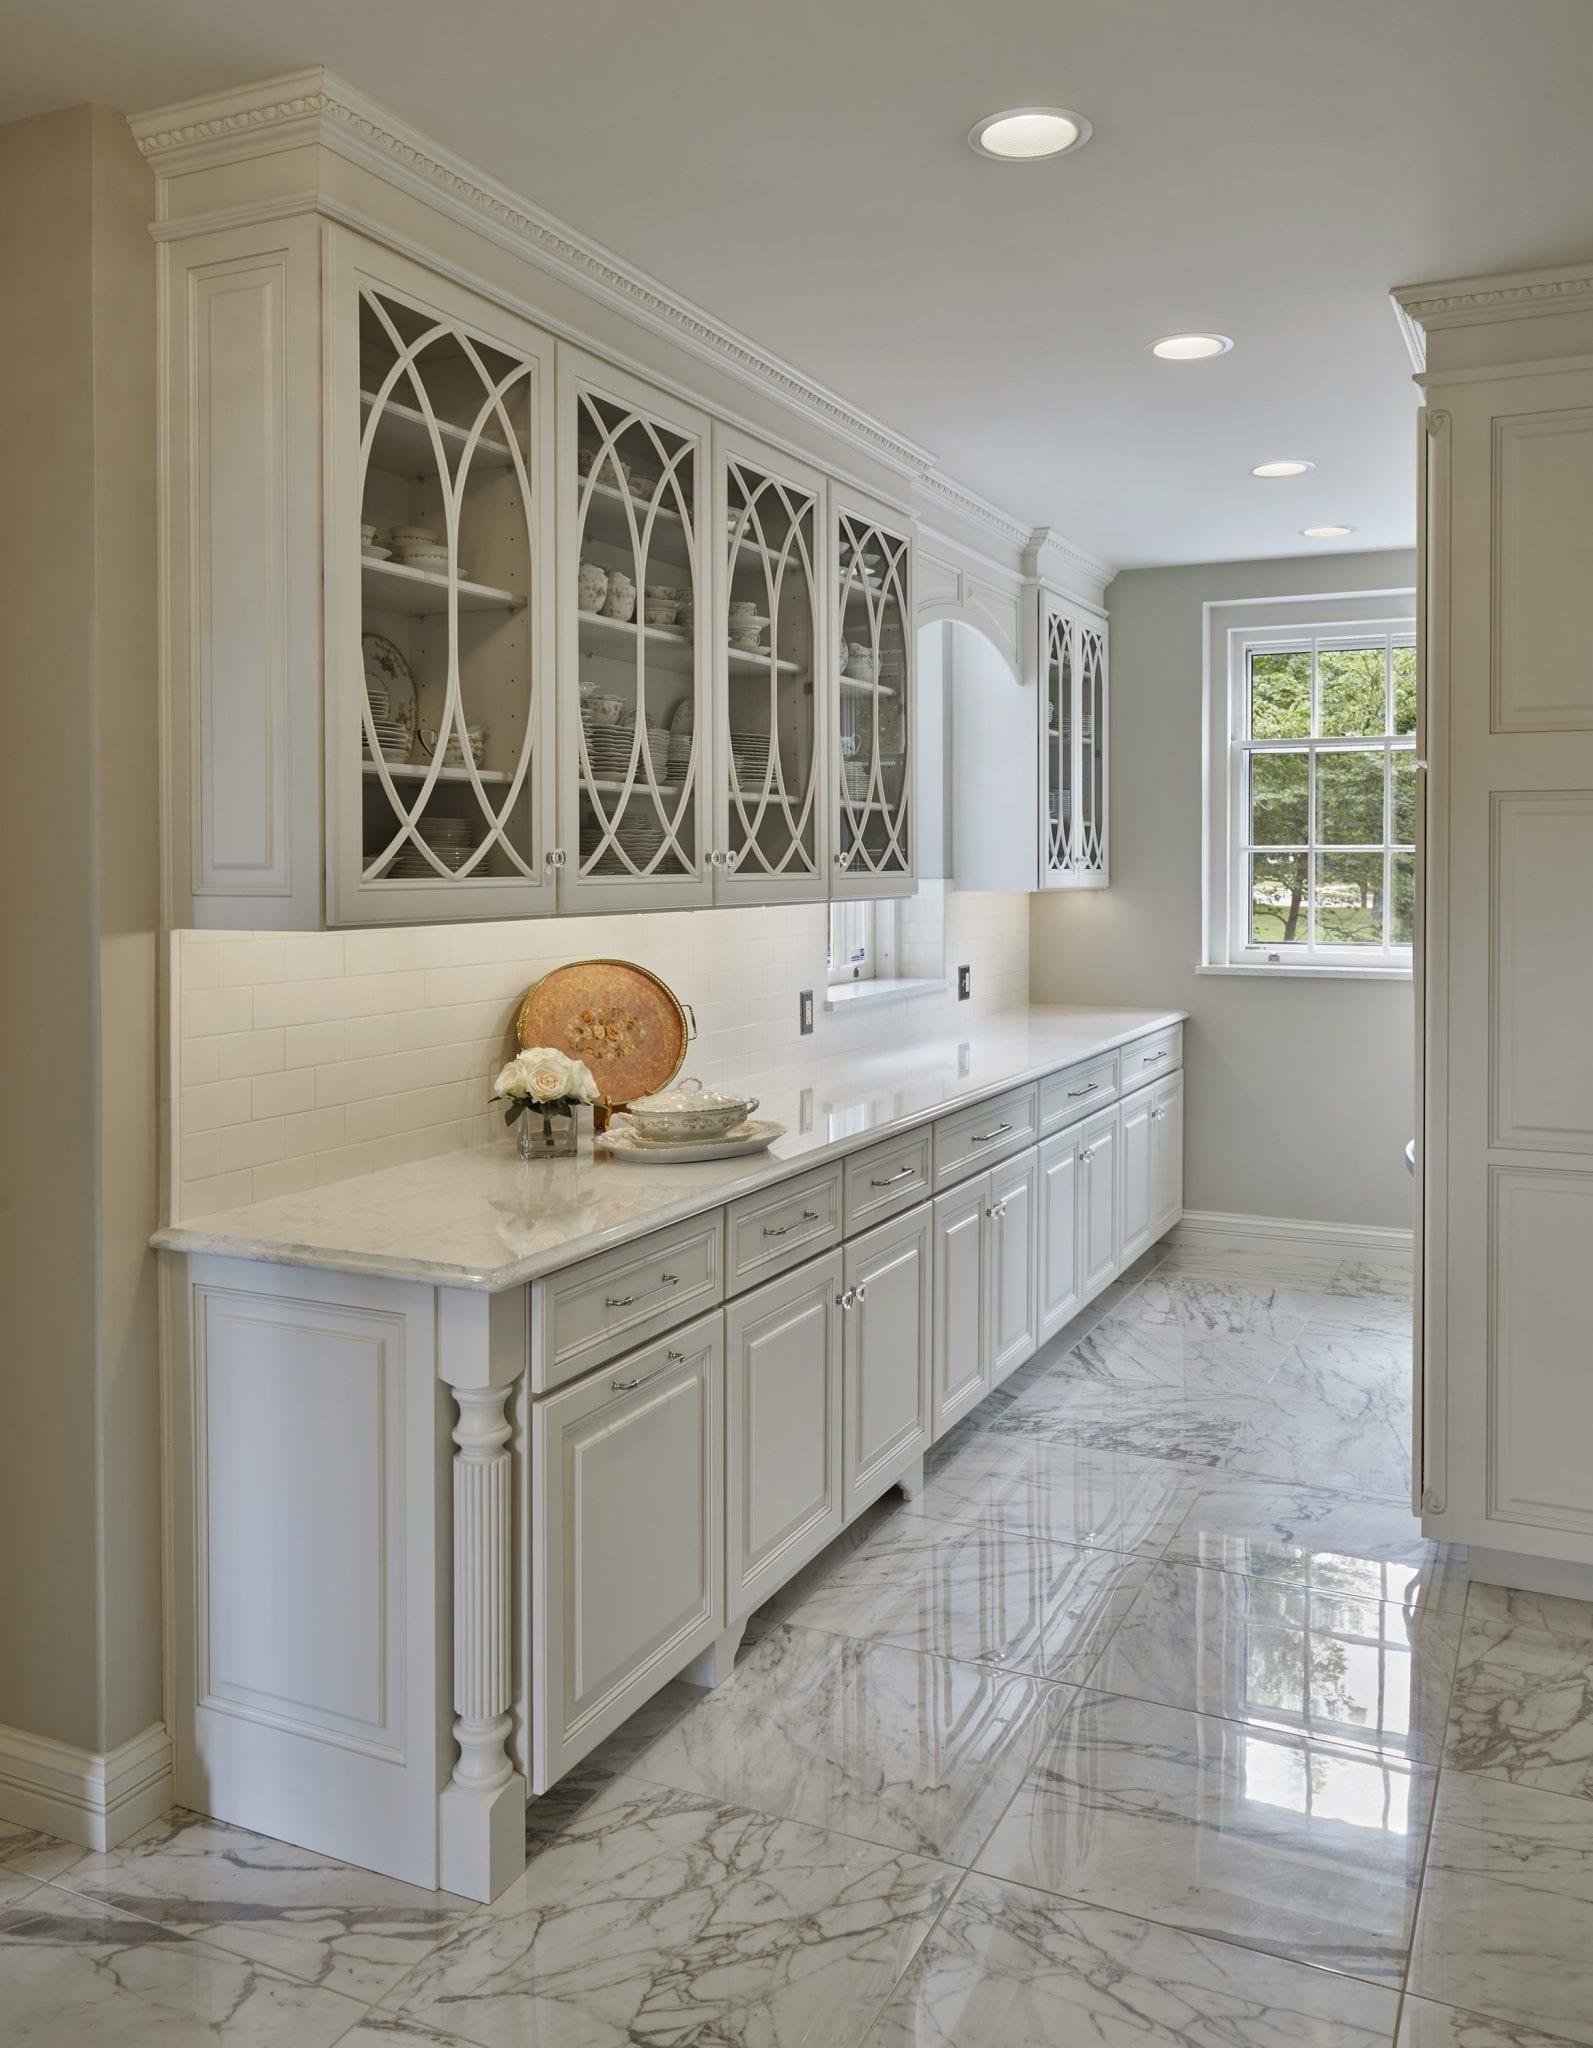 Whole 1930s Estate Kitchen Remodel Richard S Kitchen Bath Center